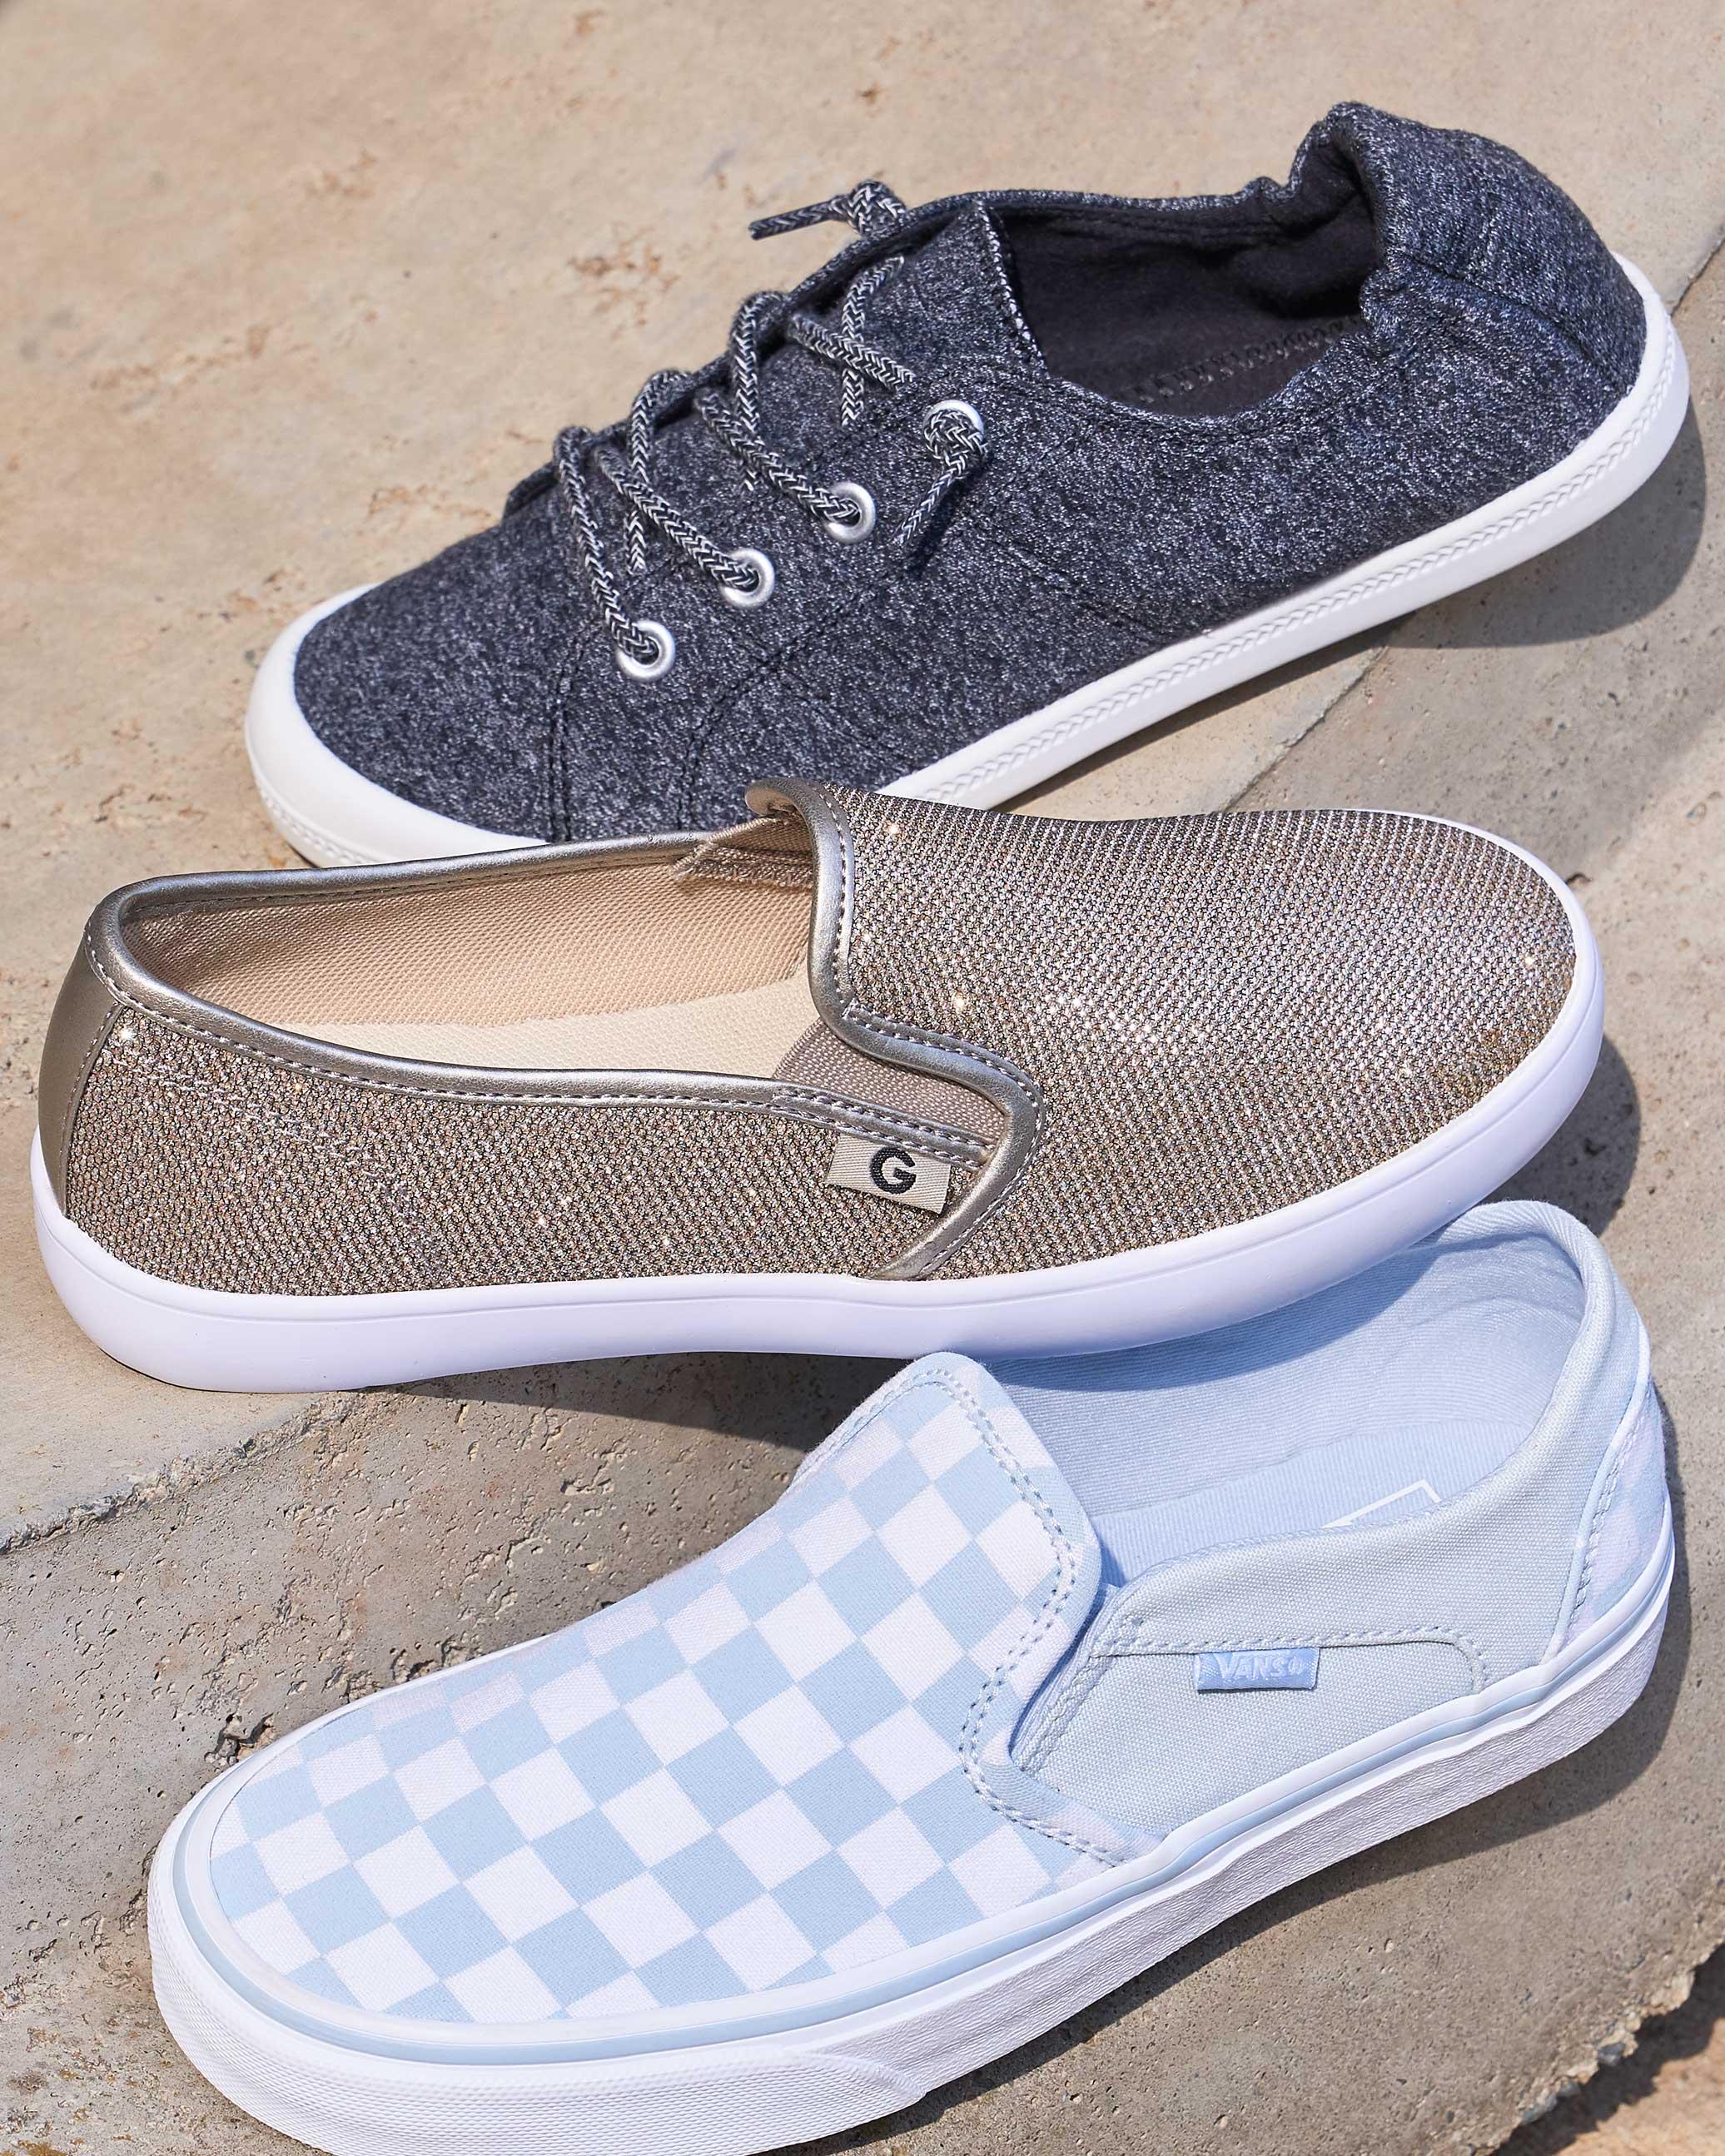 Roxy, Keds, and Vans slip-on sneakers